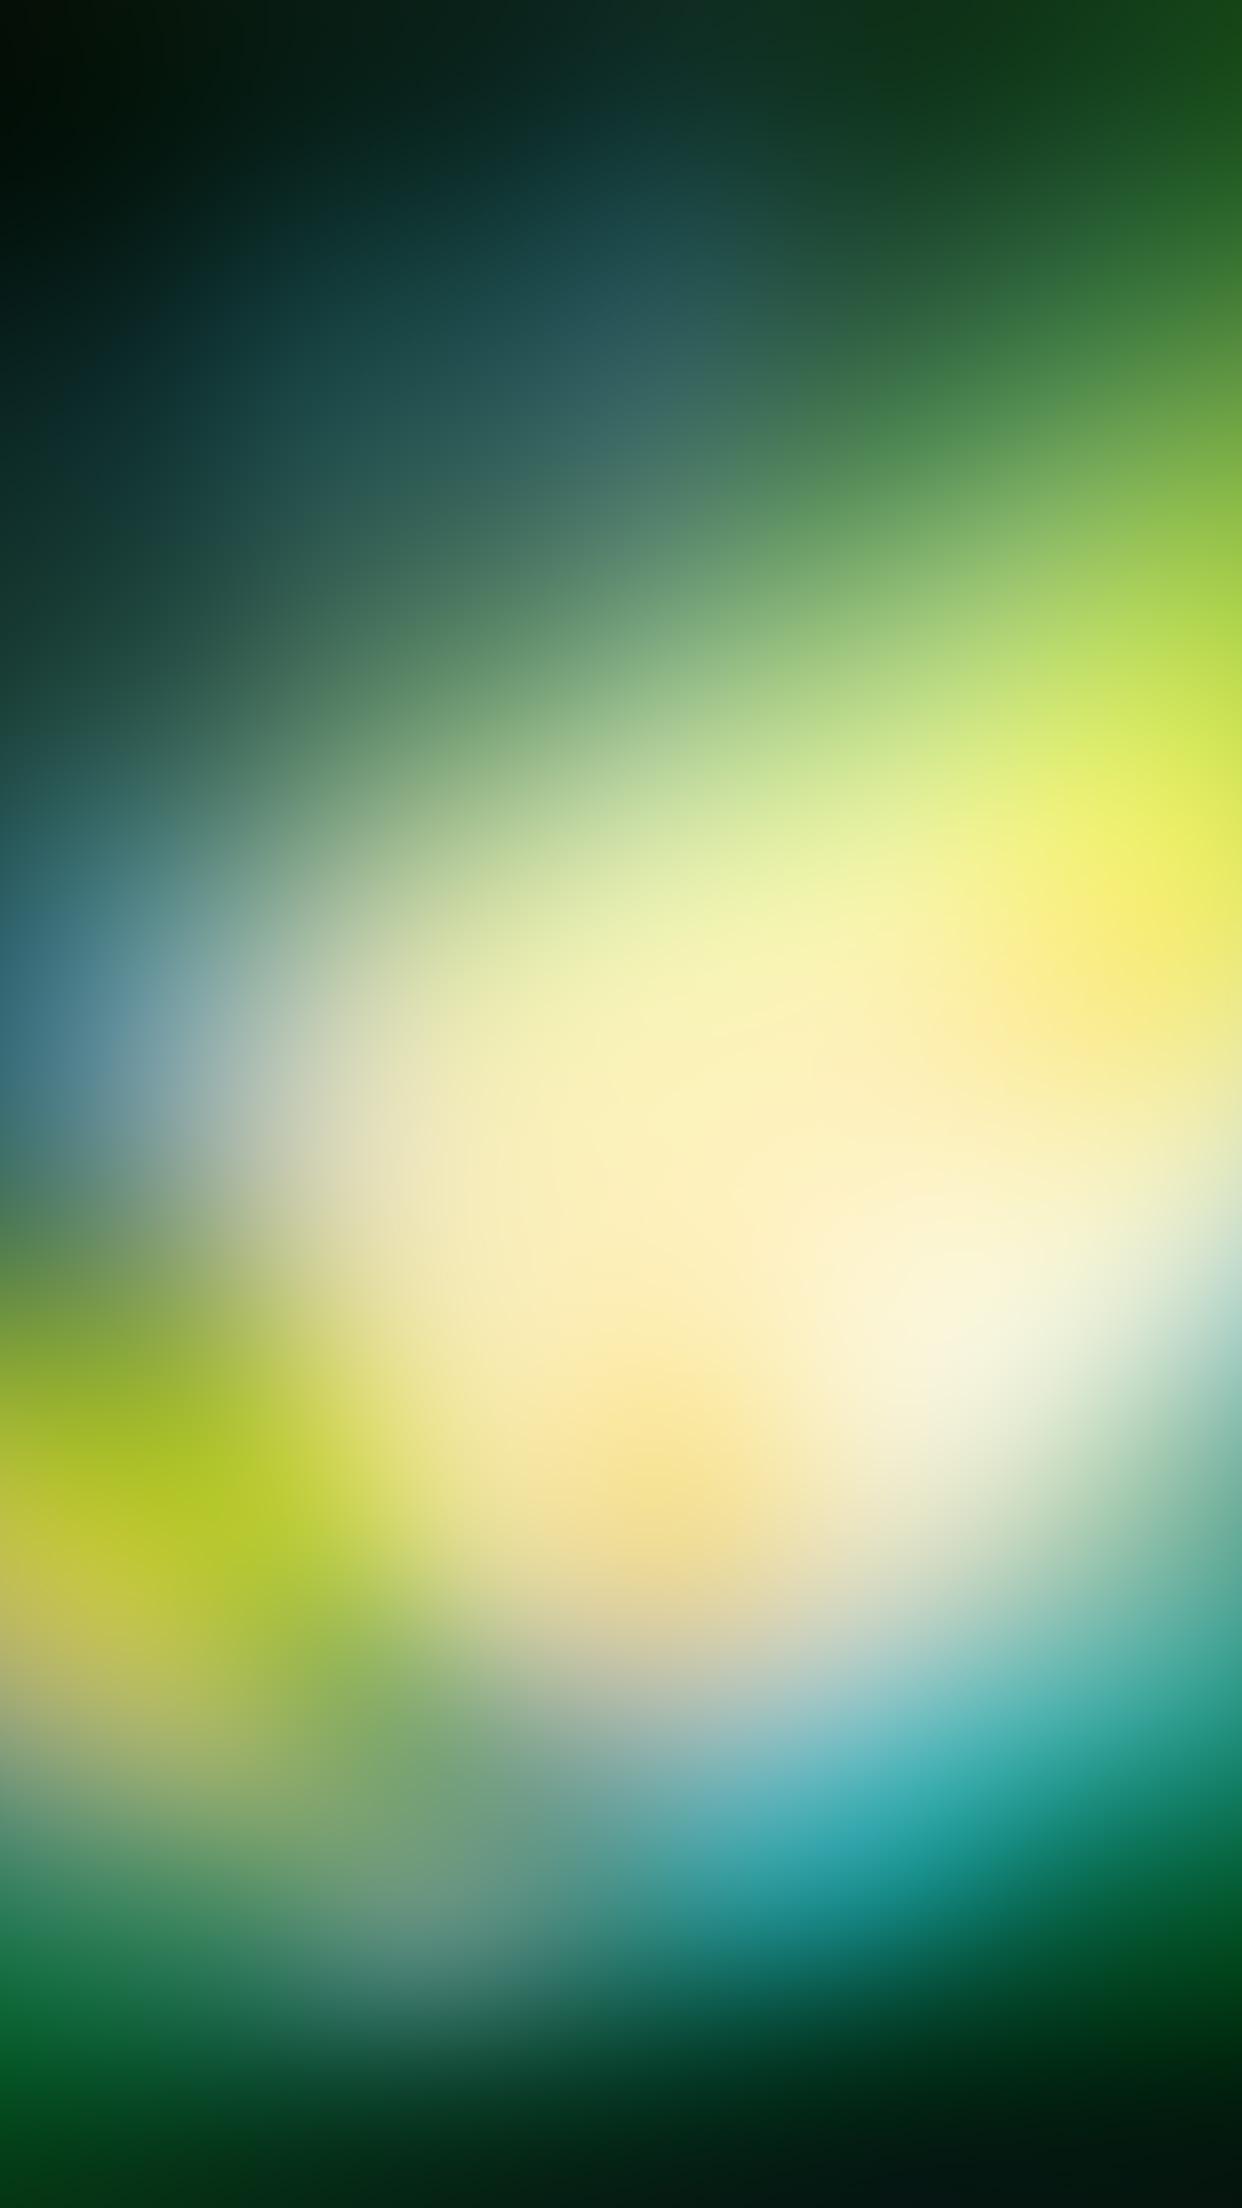 Blurred Background Anime Wallpaper - Hachiman Wallpaper